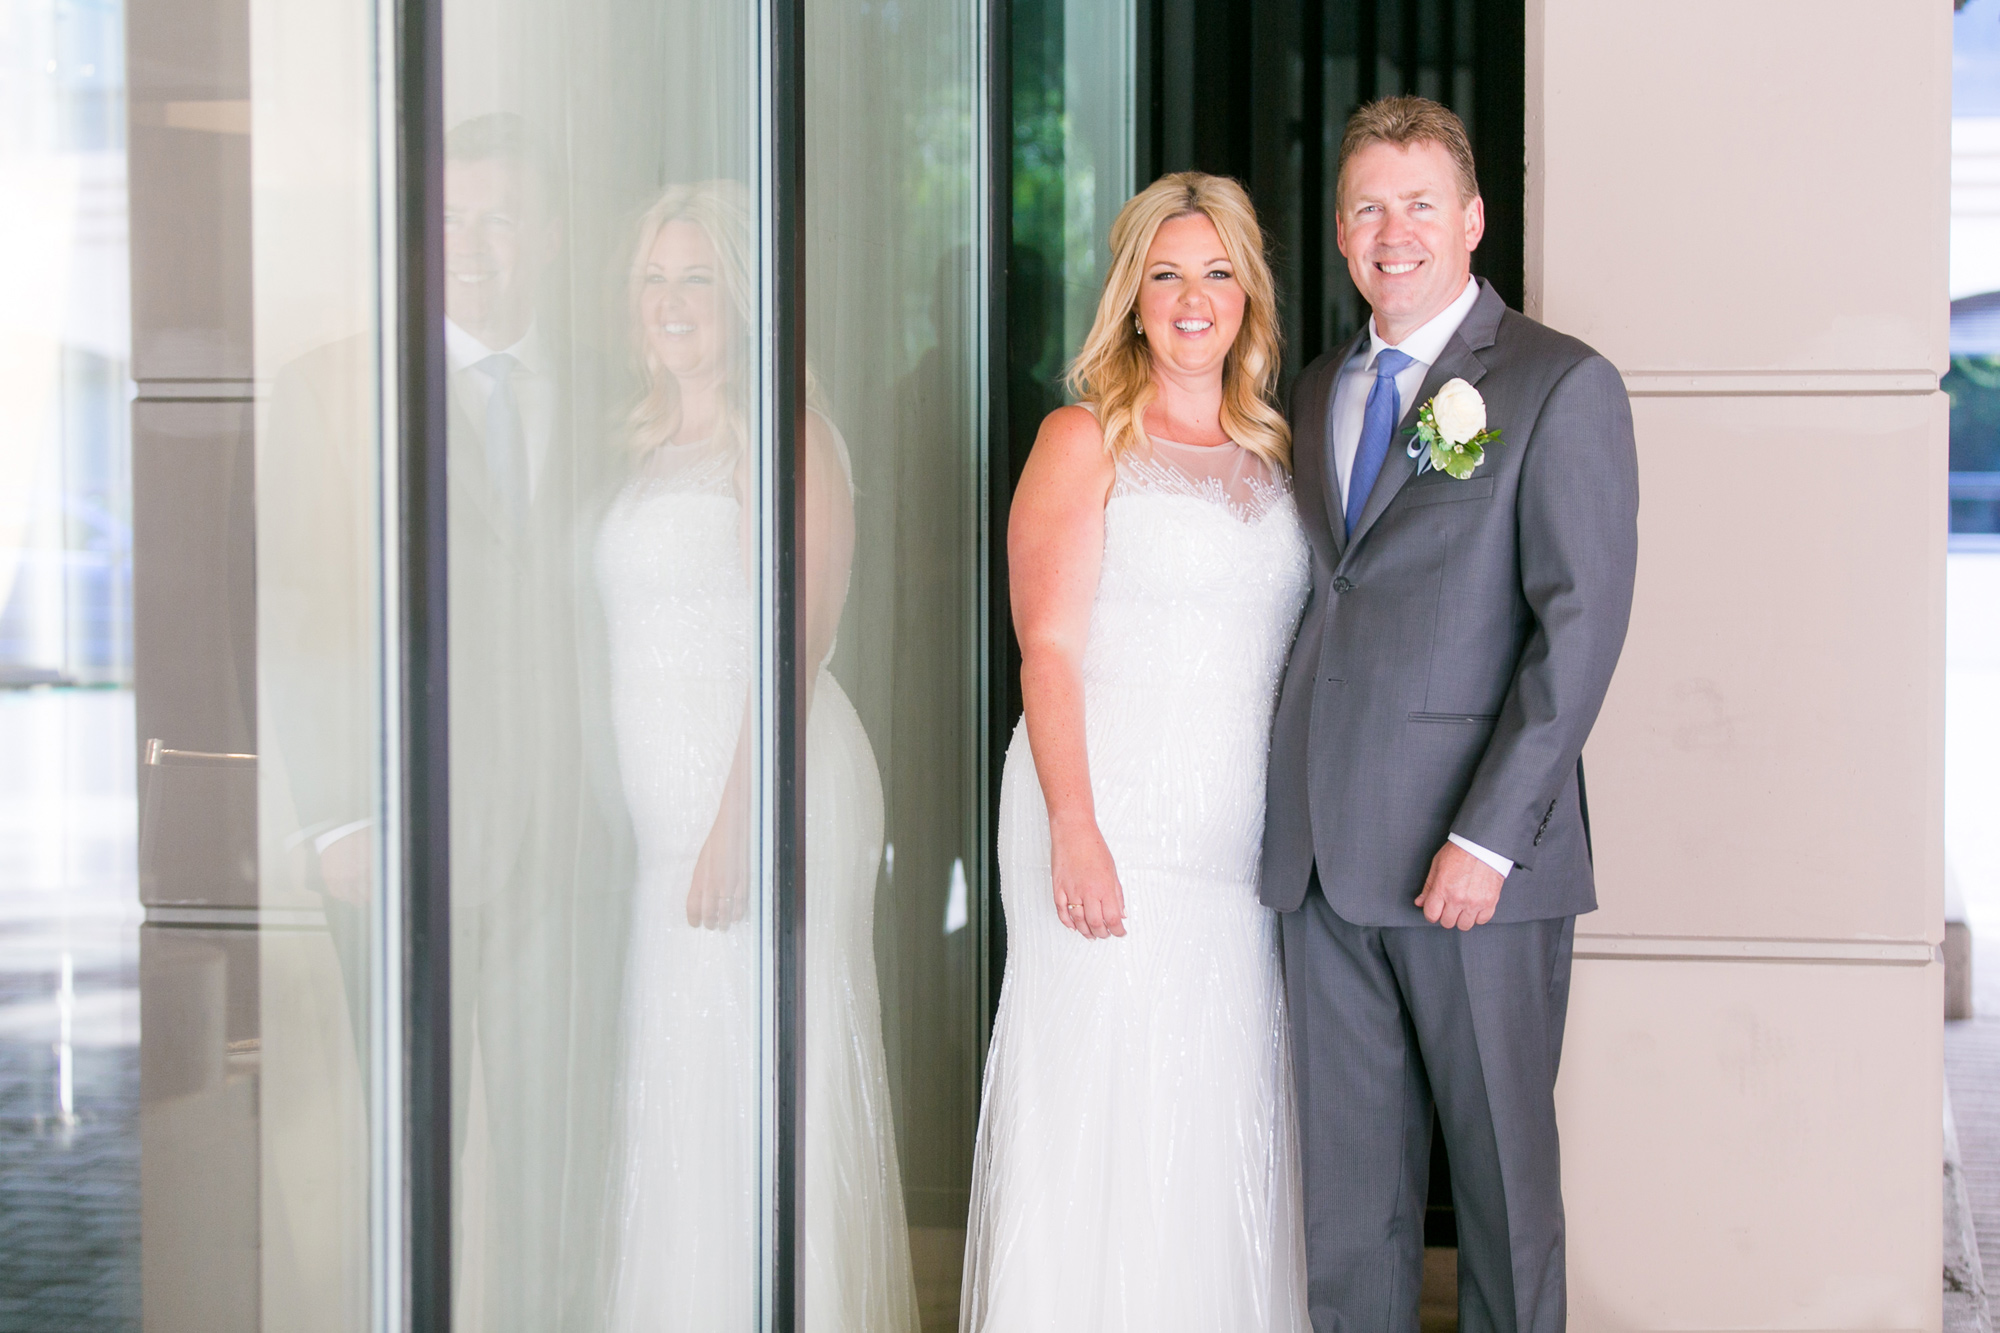 160-lord-nelson-wedding-------.jpg